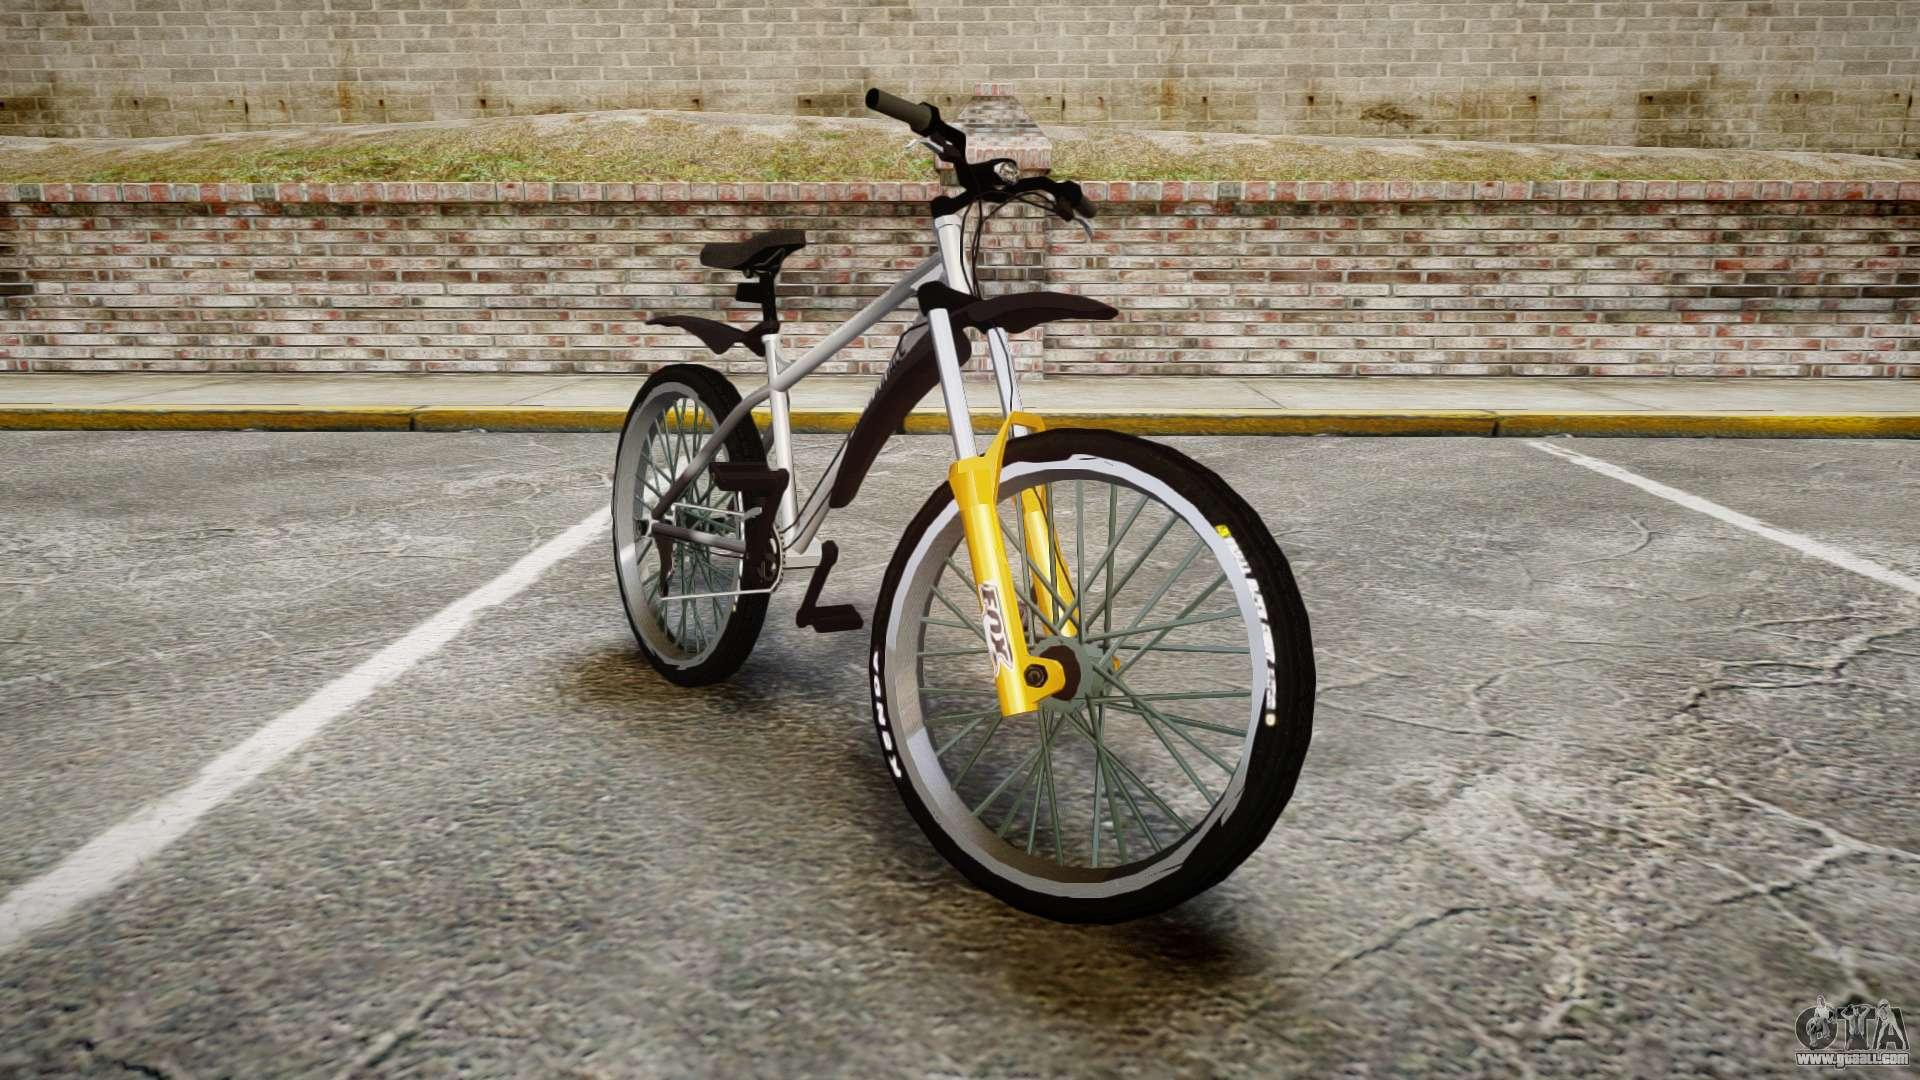 gta v how to get bike